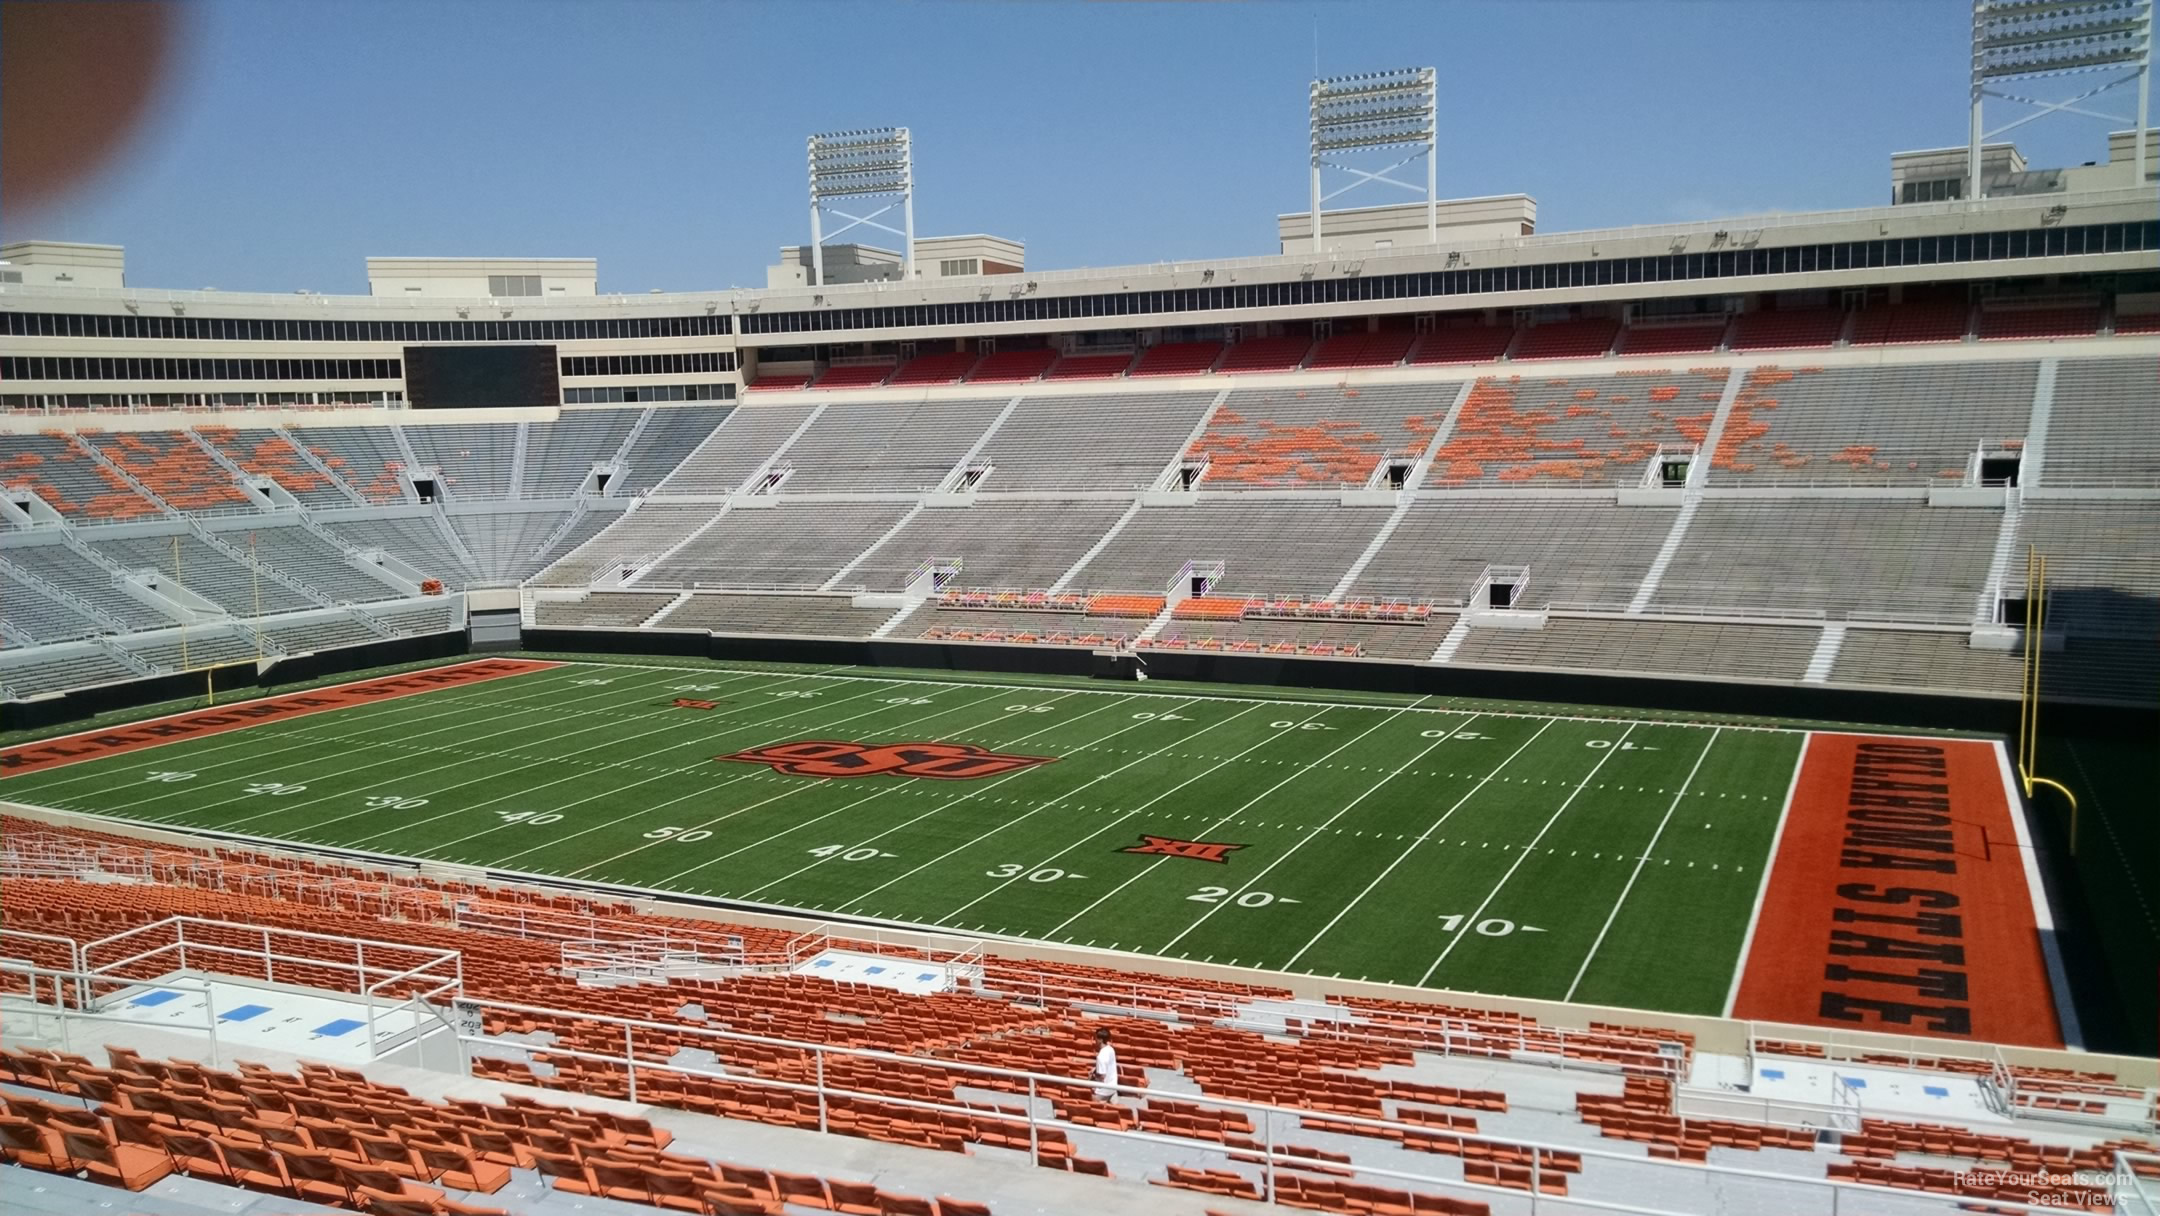 Boone Pickens Stadium Section 302 - RateYourSeats.com